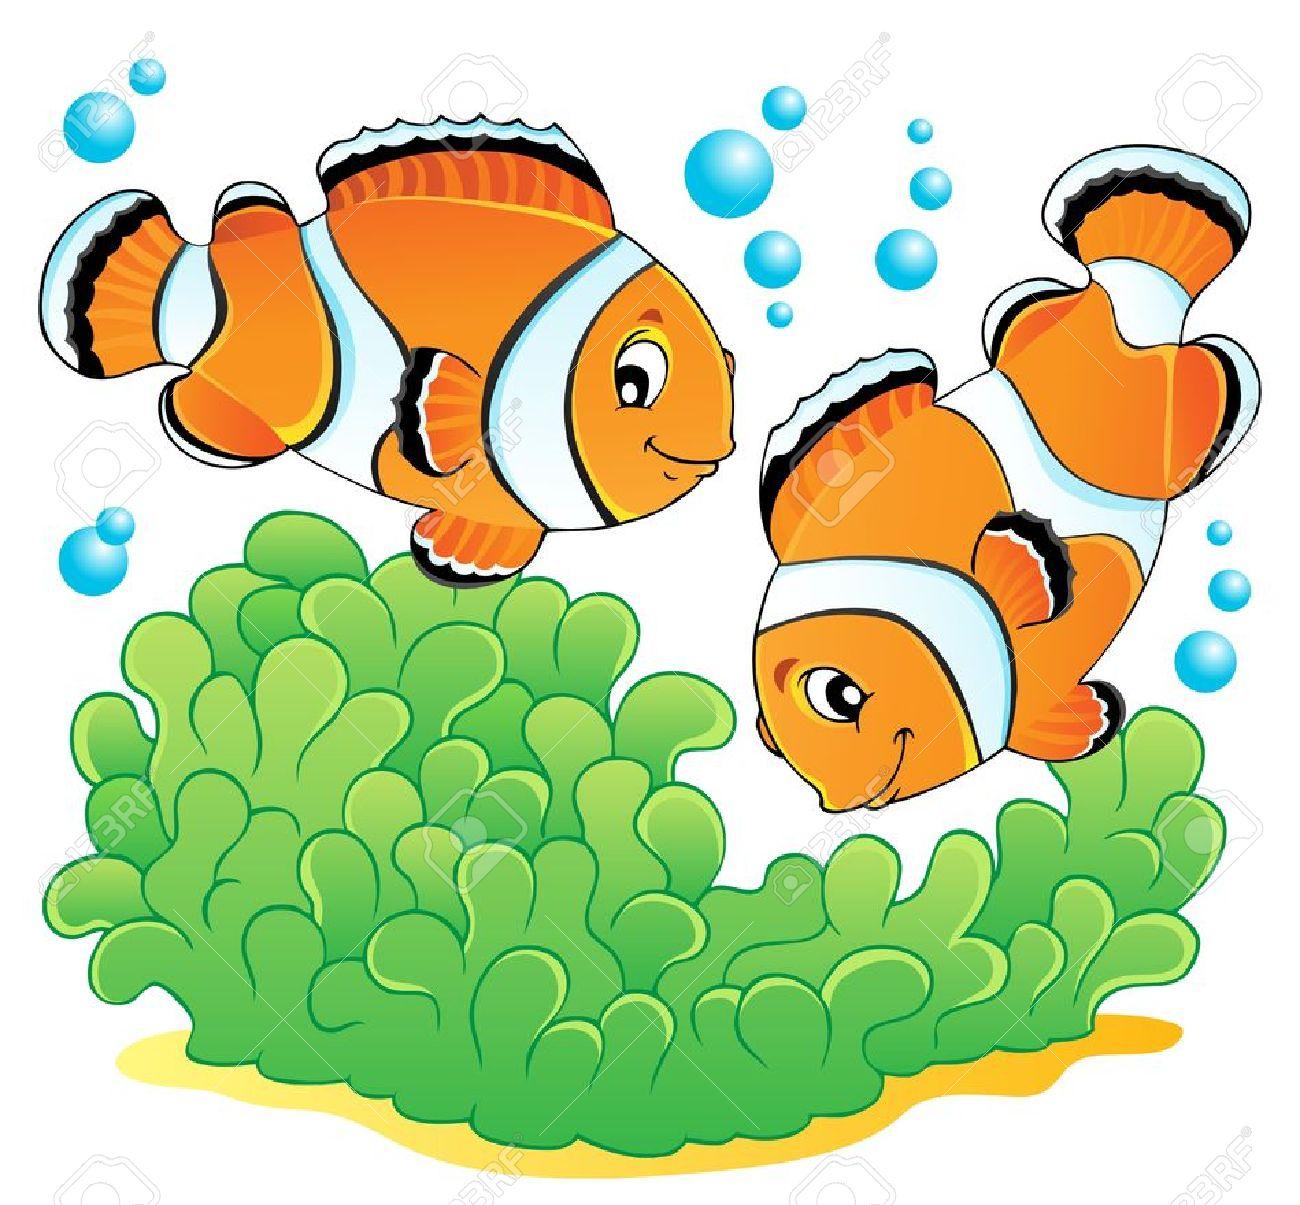 Clown Fish Theme Image 1 Illustration Royalty Free Cliparts.